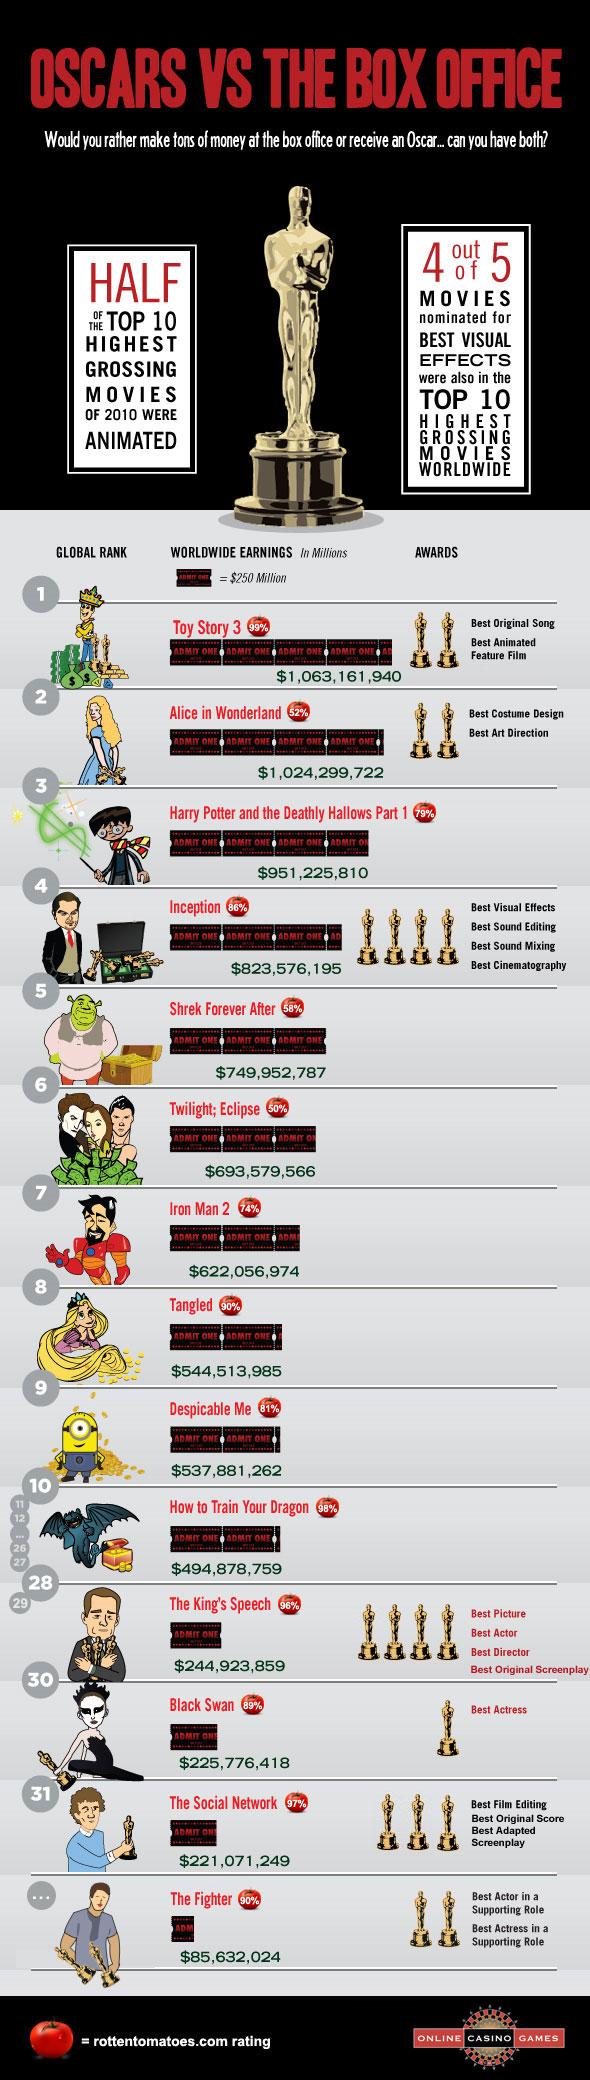 Oscars vs. Box Office